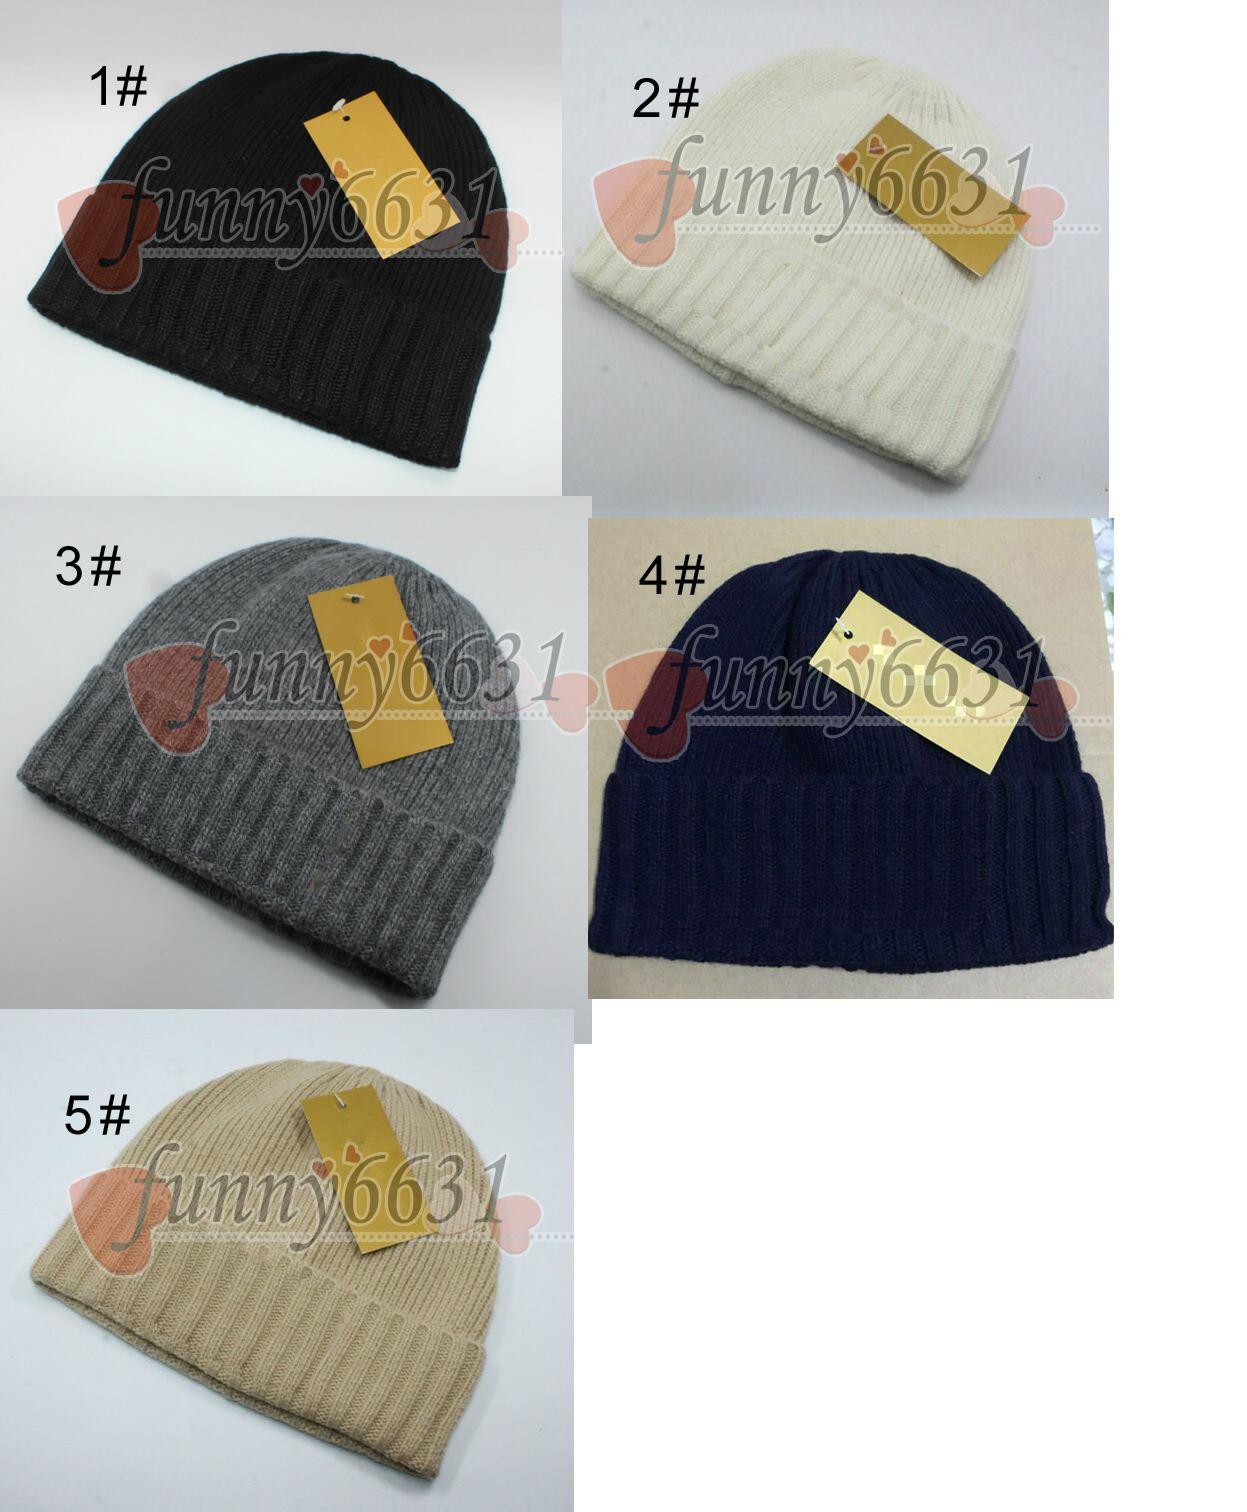 Winter Autumn Hats For Women Men Brand style Fashion Beanies Skullies Chapeu Caps Cotton Gorros Touca De Inverno Macka hat freeship